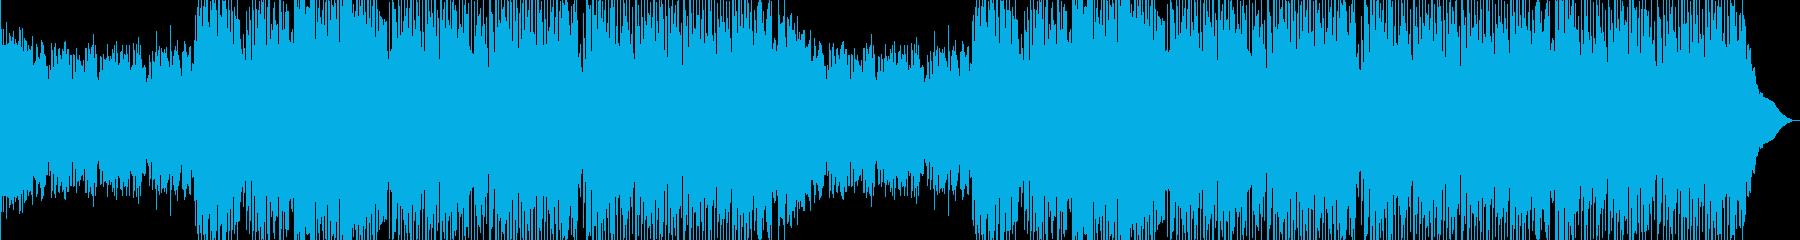 【EDM】力強いエネルギッシュなナンバーの再生済みの波形